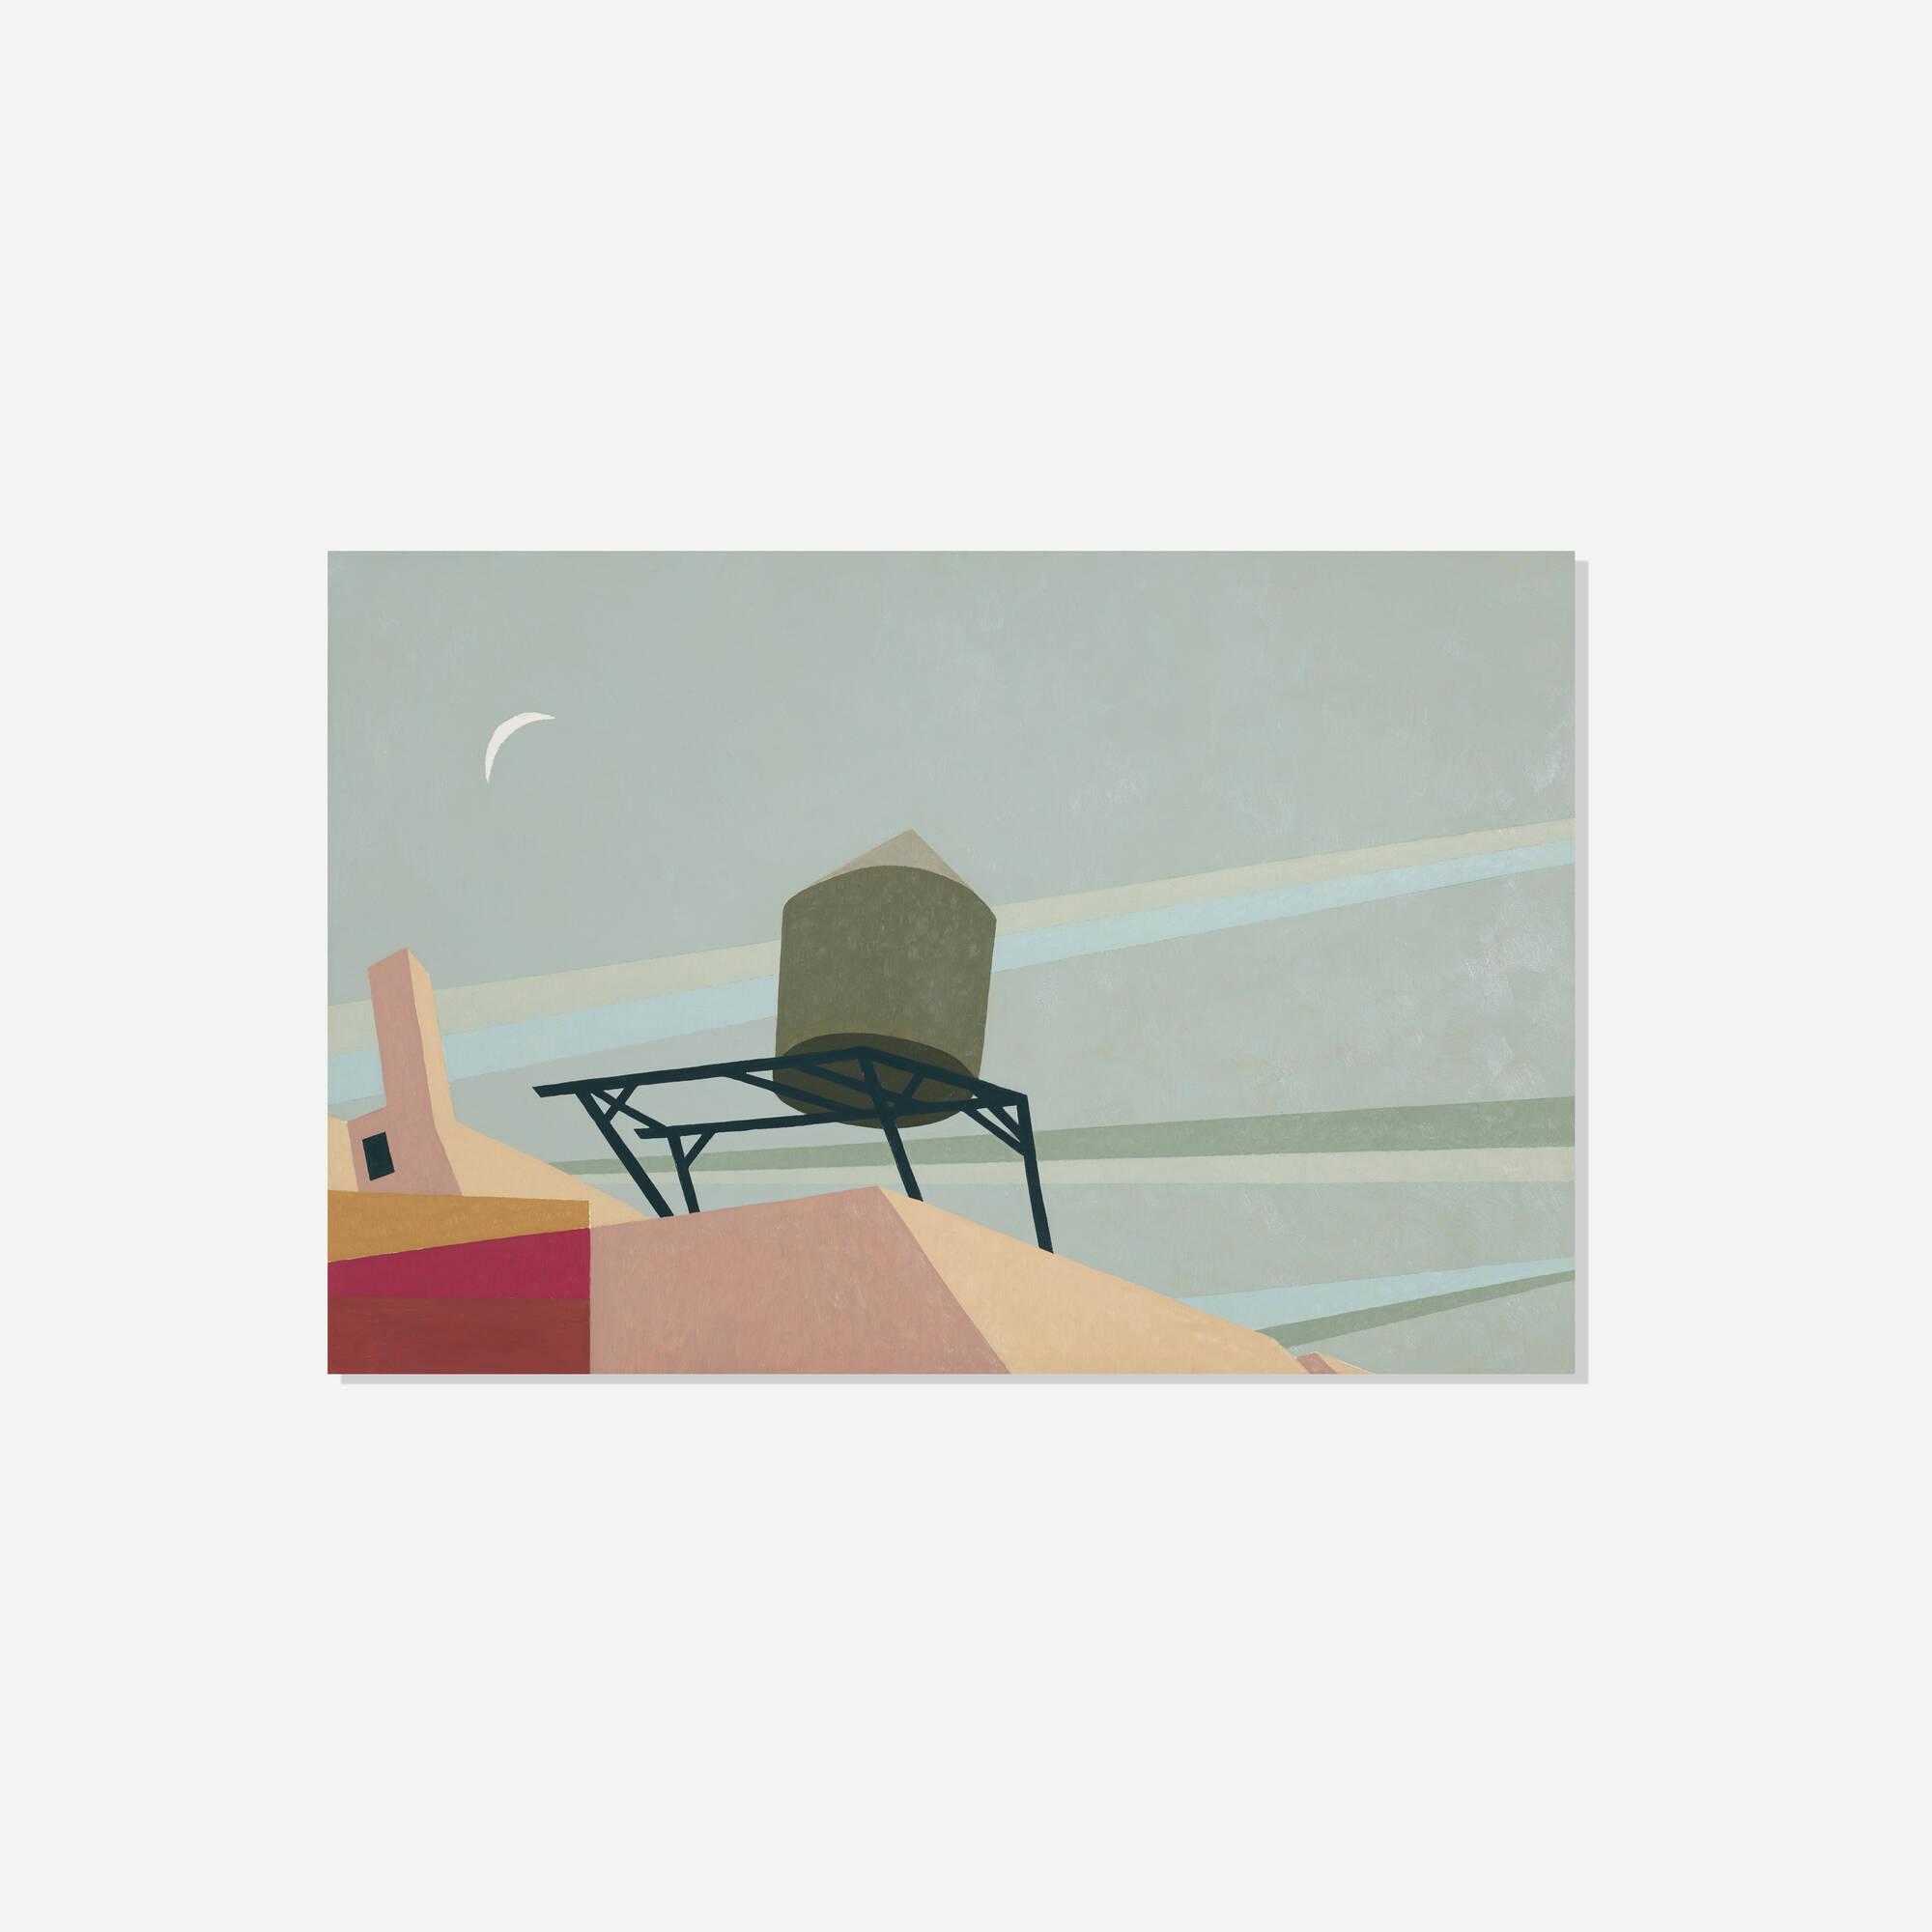 418: Robert Herrmann / Wind, Moonlight, Water-Tank (1 of 2)